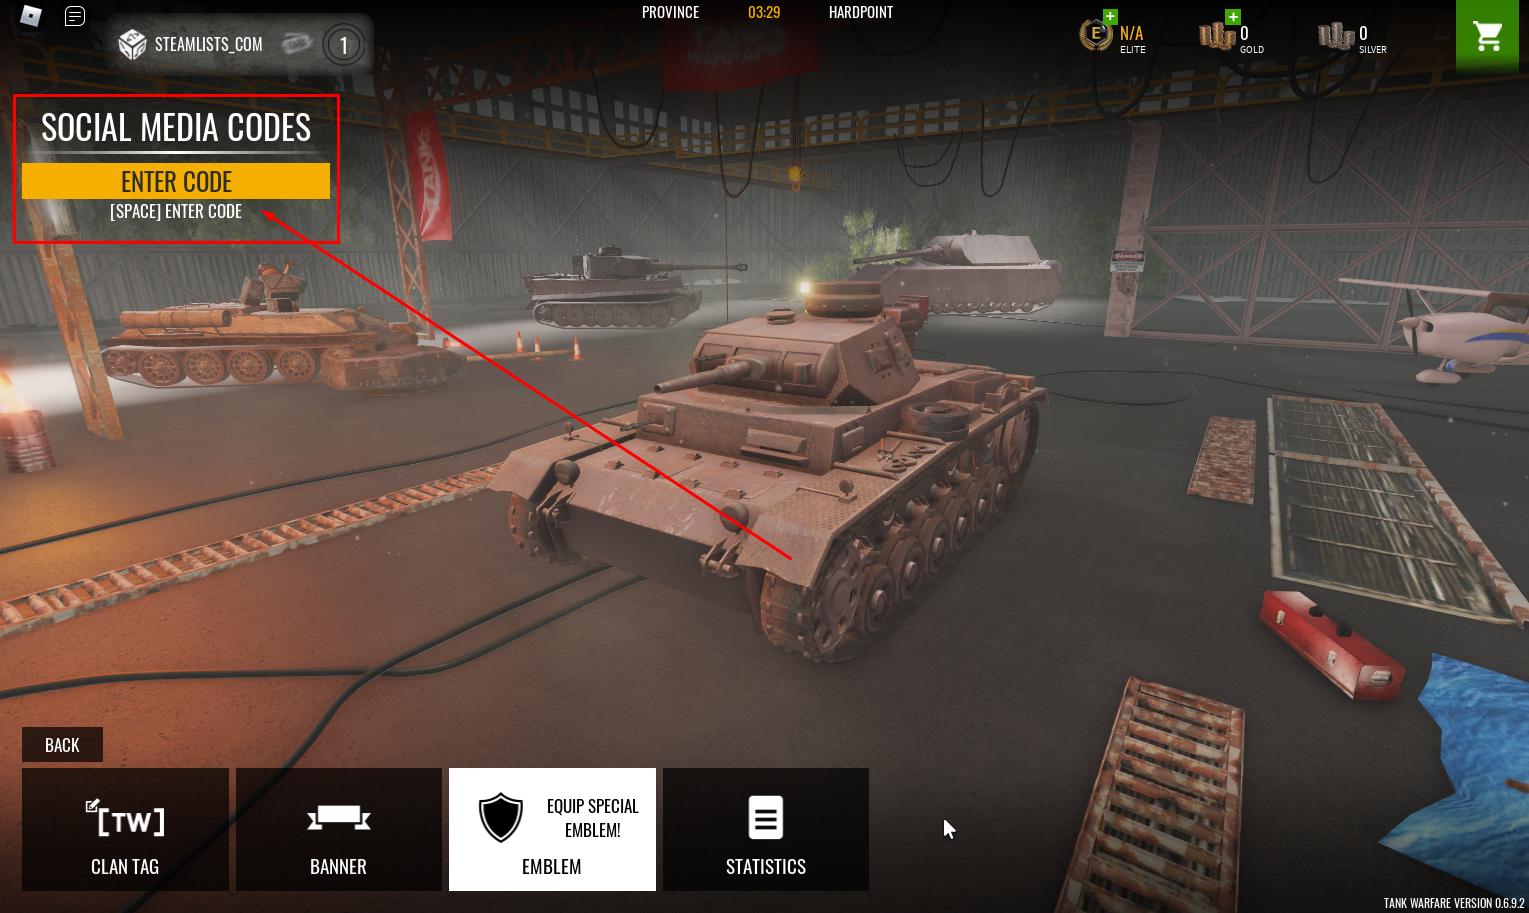 Roblox – Tank Warfare Codes (September 2021) 9 - steamlists.com